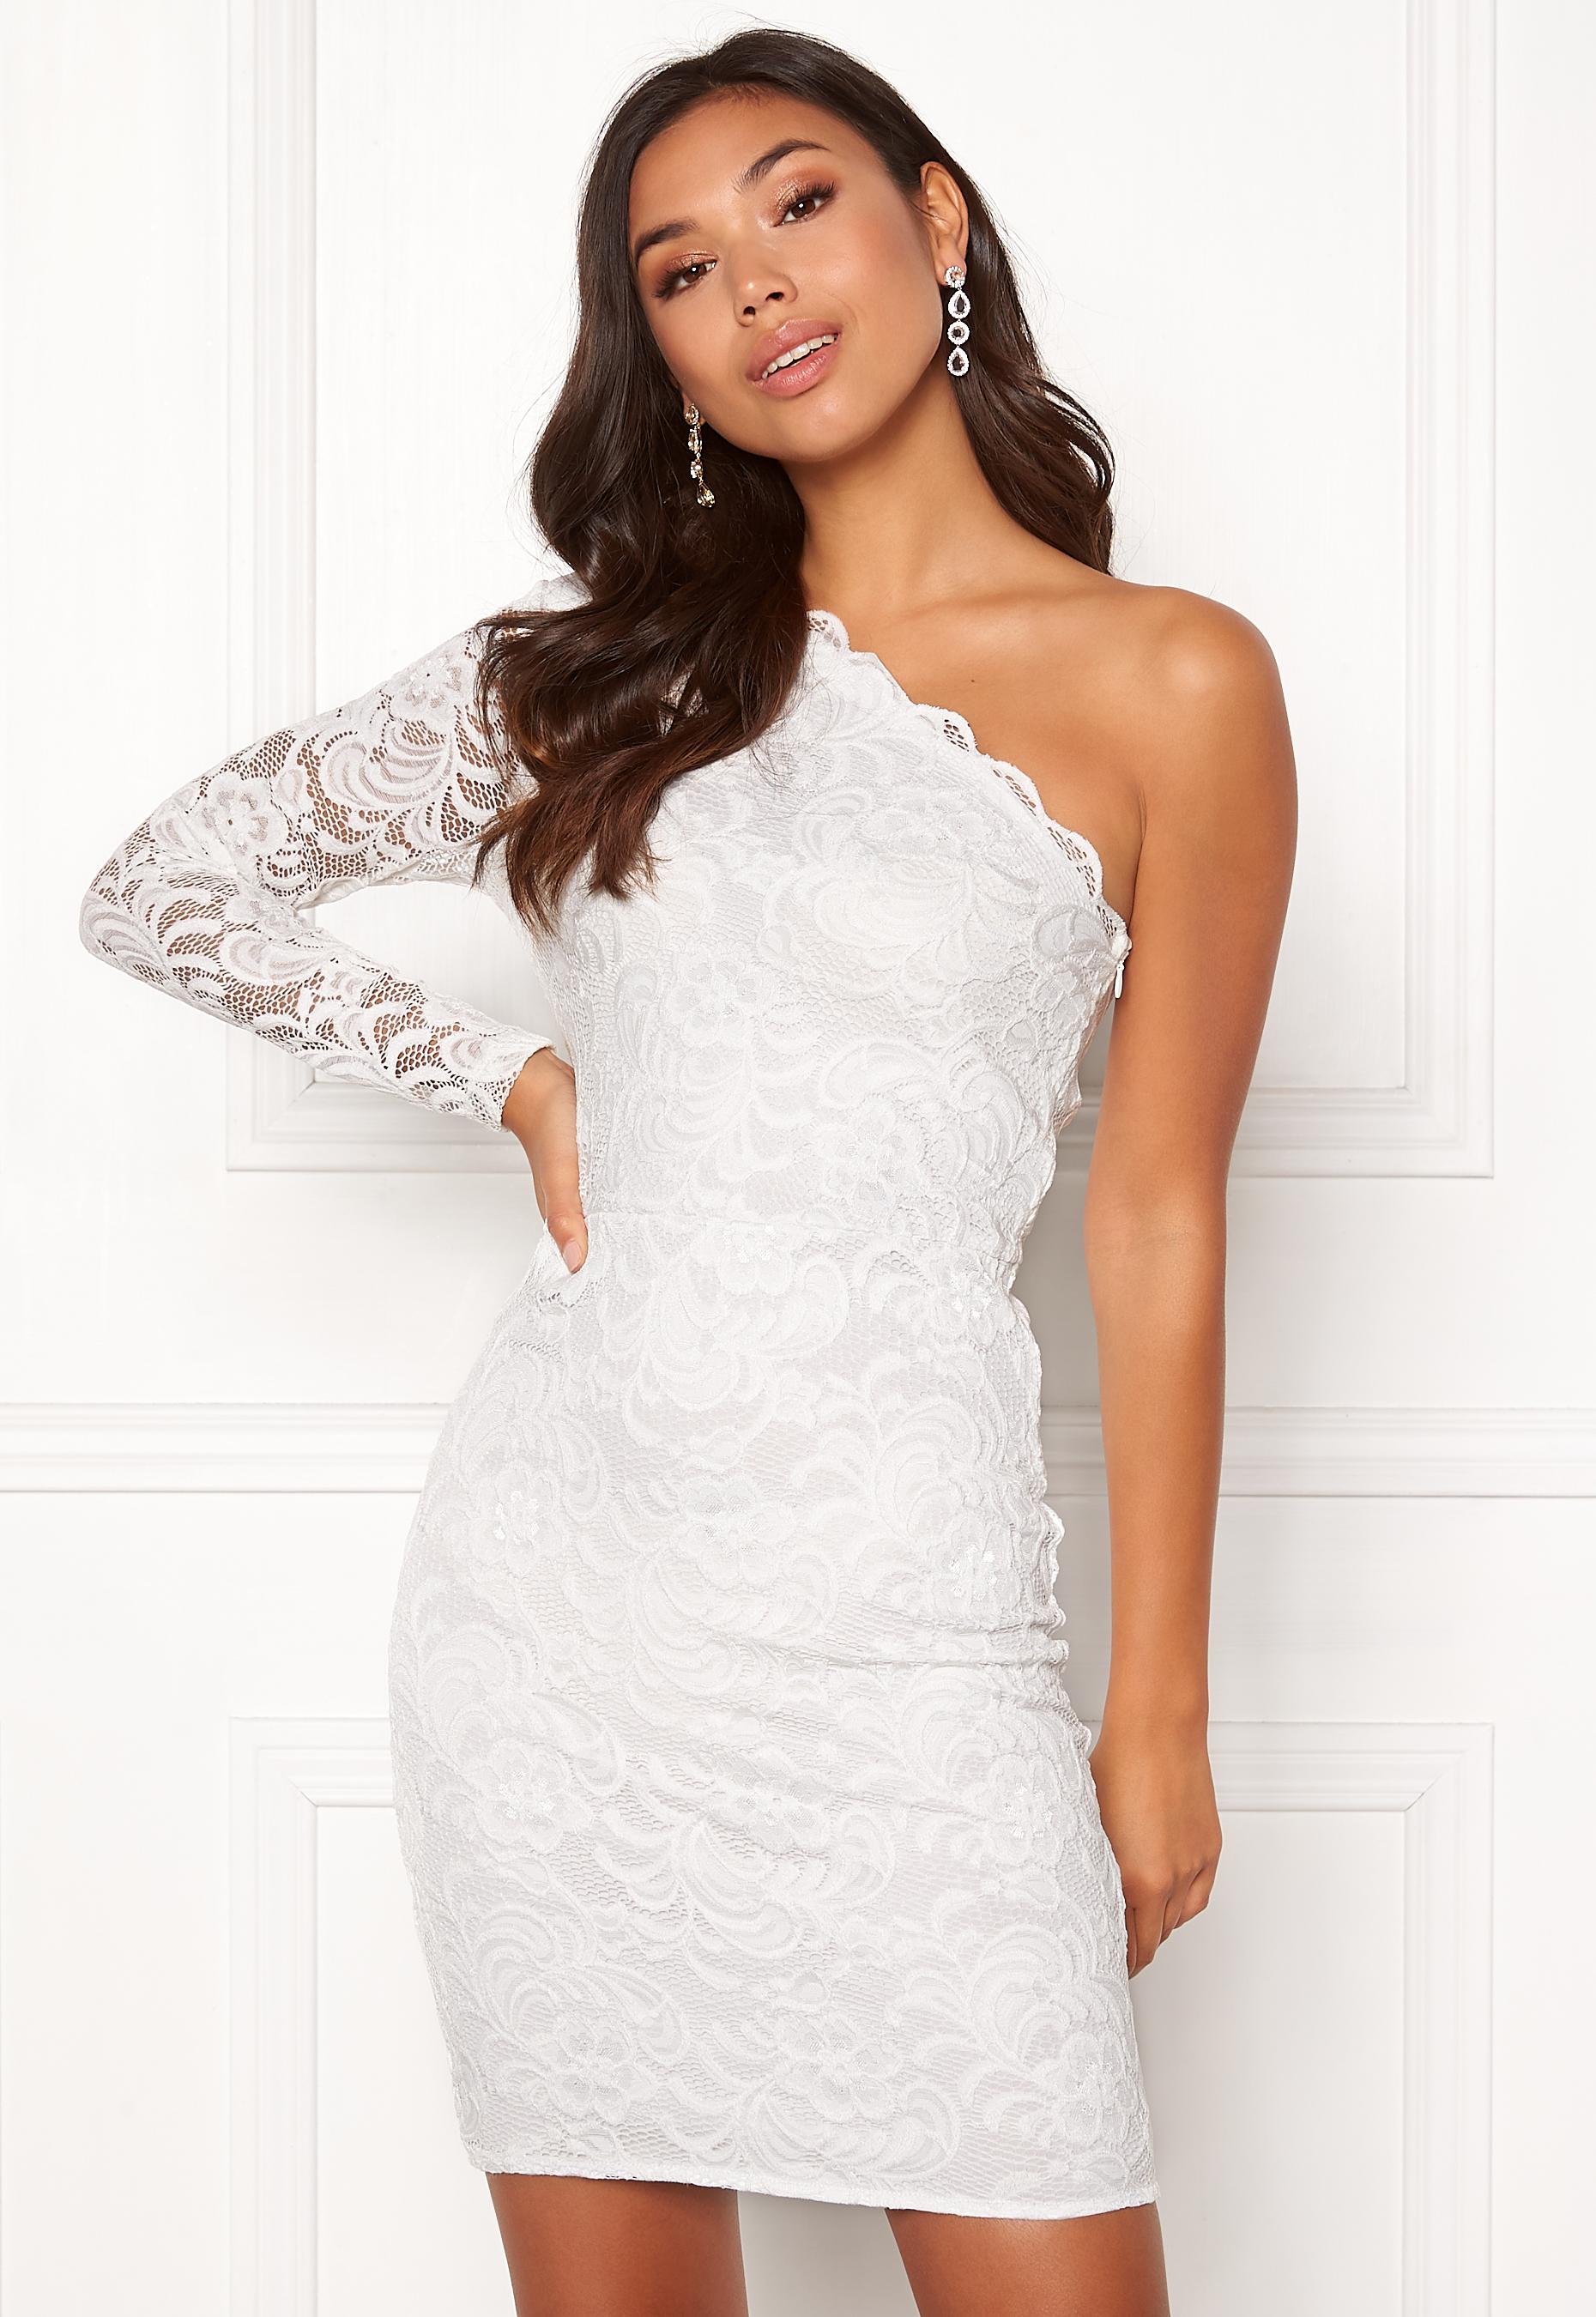 355b17ec333 BUBBLEROOM Marianna lace one shoulder dress White - Bubbleroom